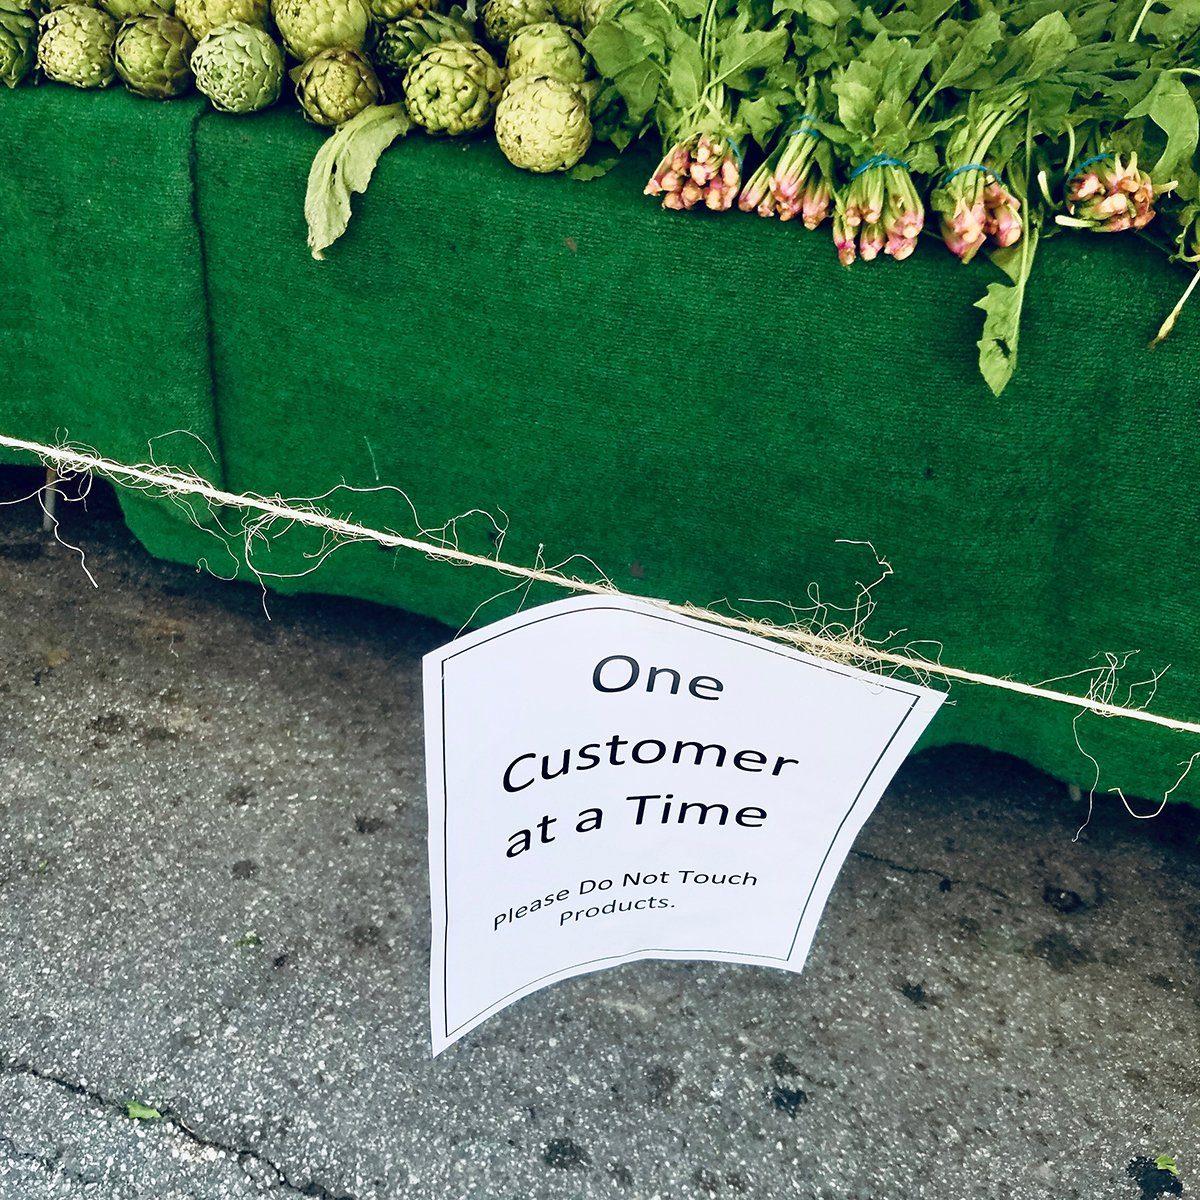 Farmers Market Social Distancing